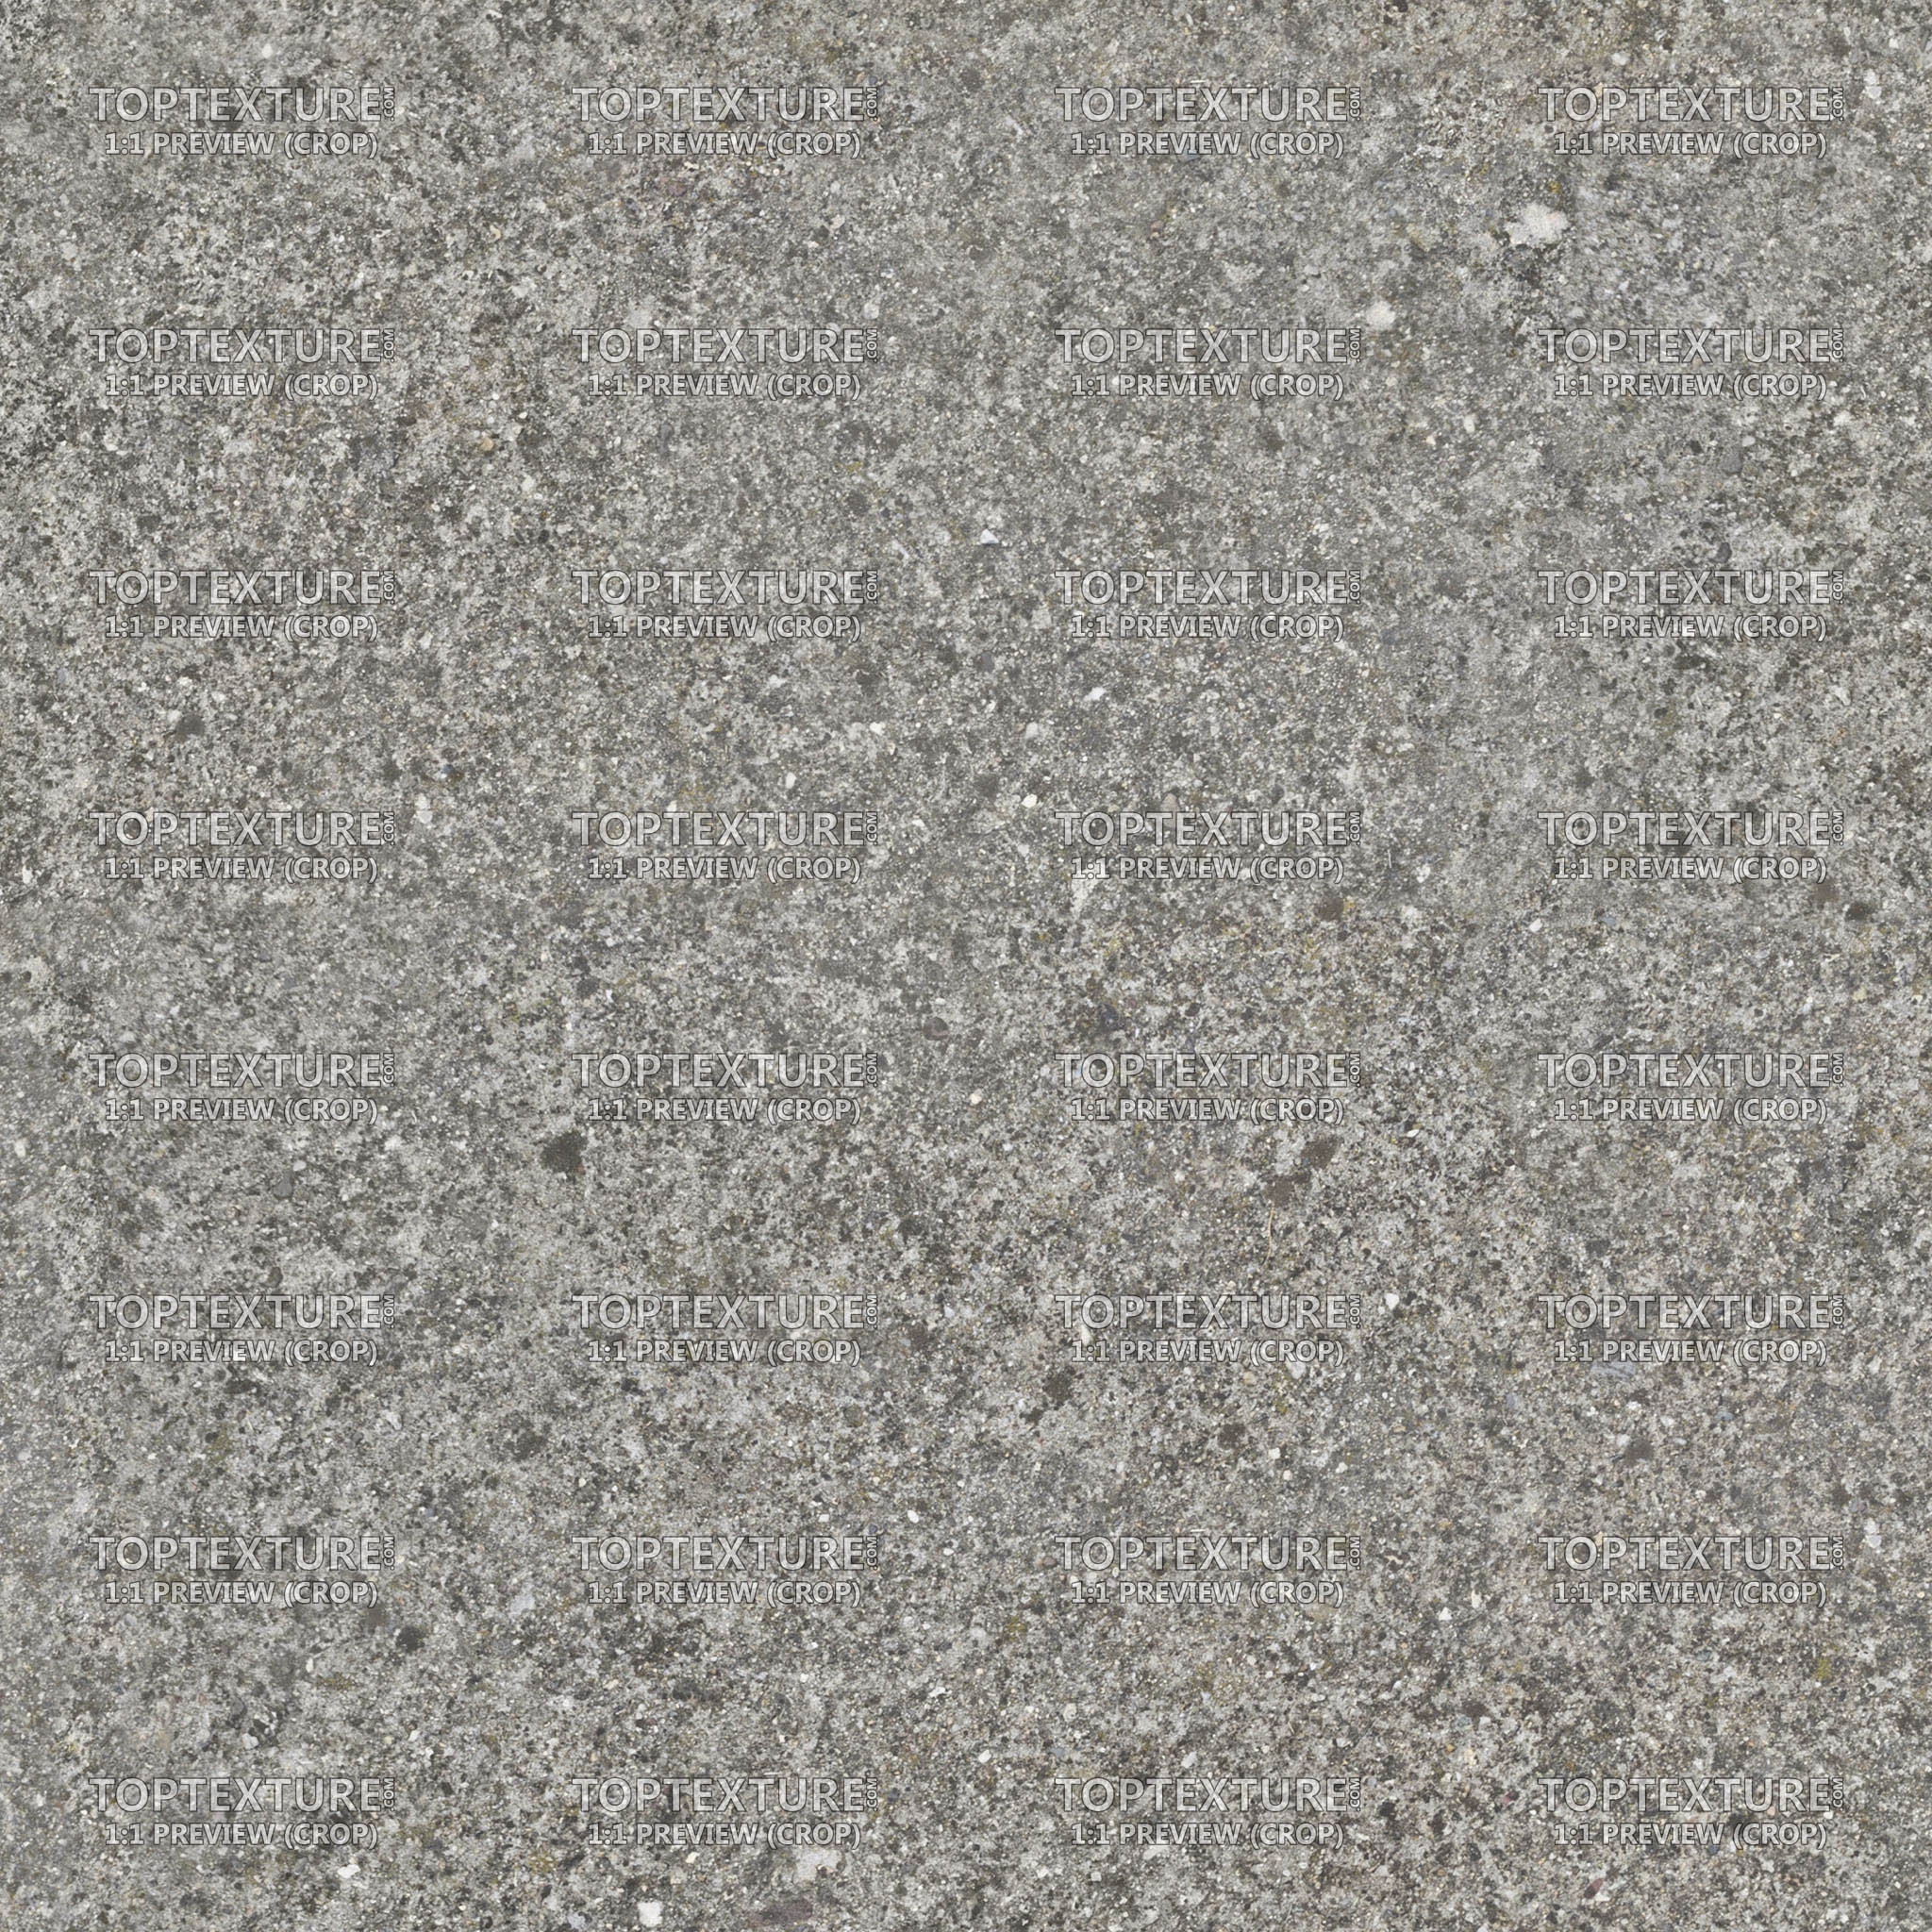 Ground Concrete Floor  Top Texture